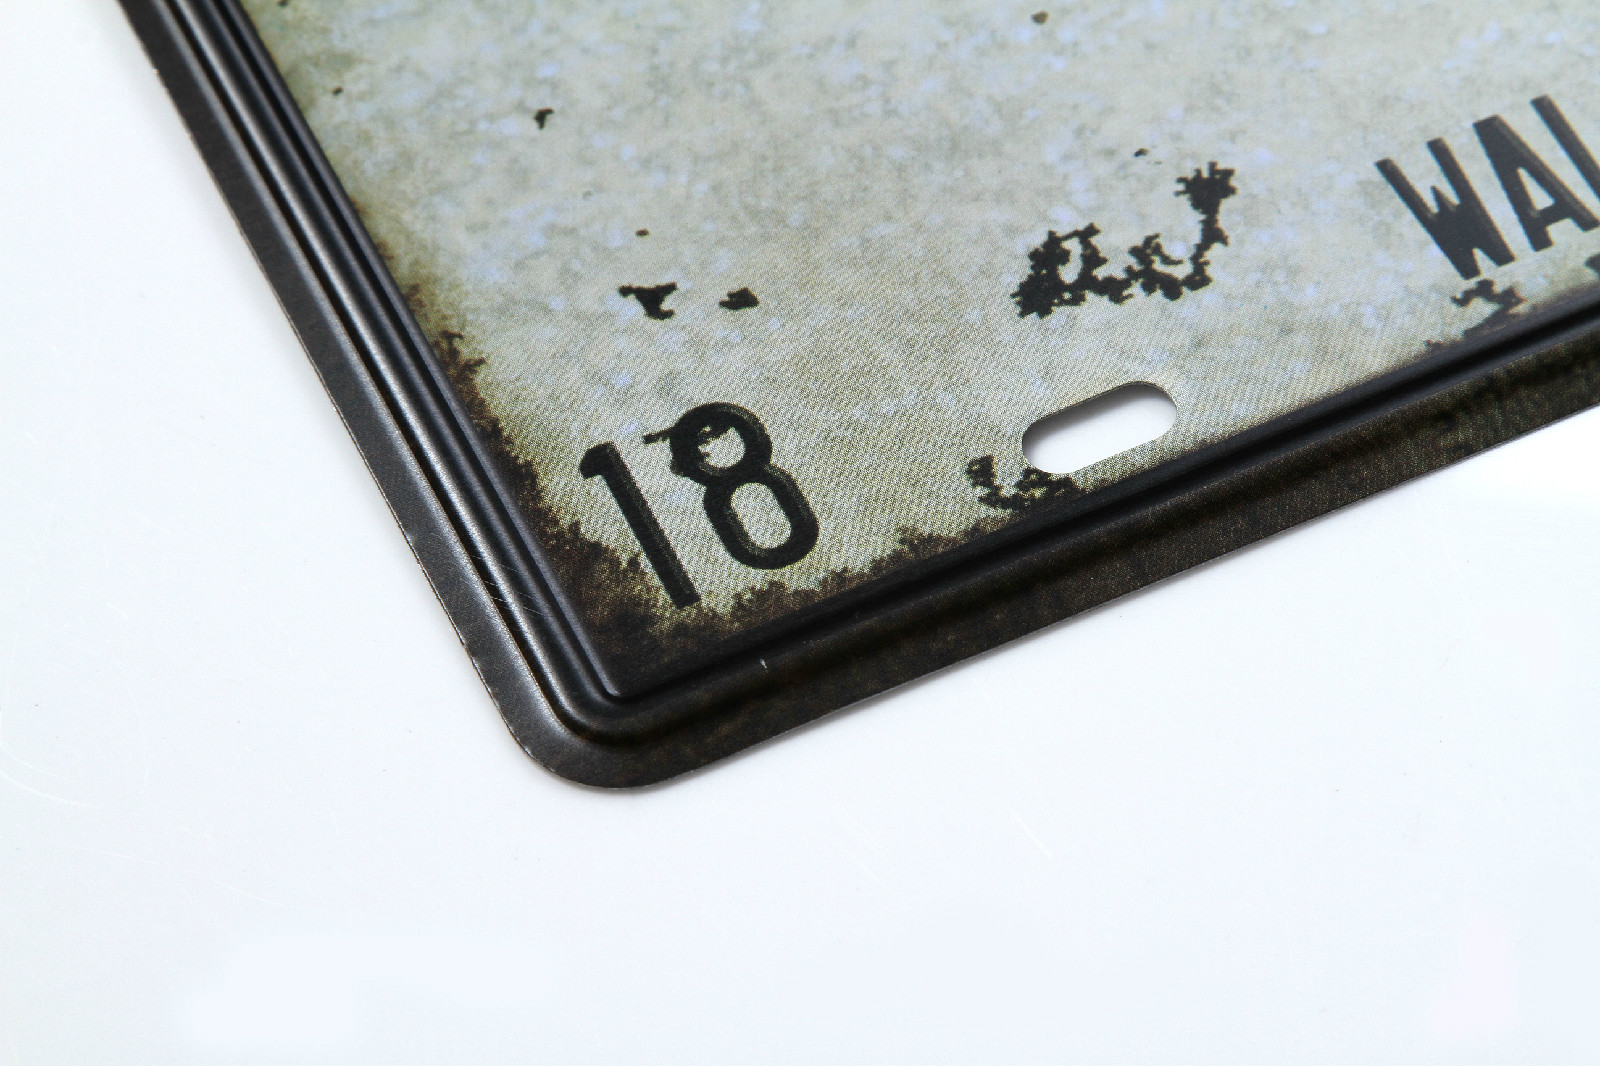 Vintage Car Plate USA FBI FBI-007 Wall Art Craft Vintage Iron Metal Painting for Bar Decor Decorative Metal Plate Iron Plate